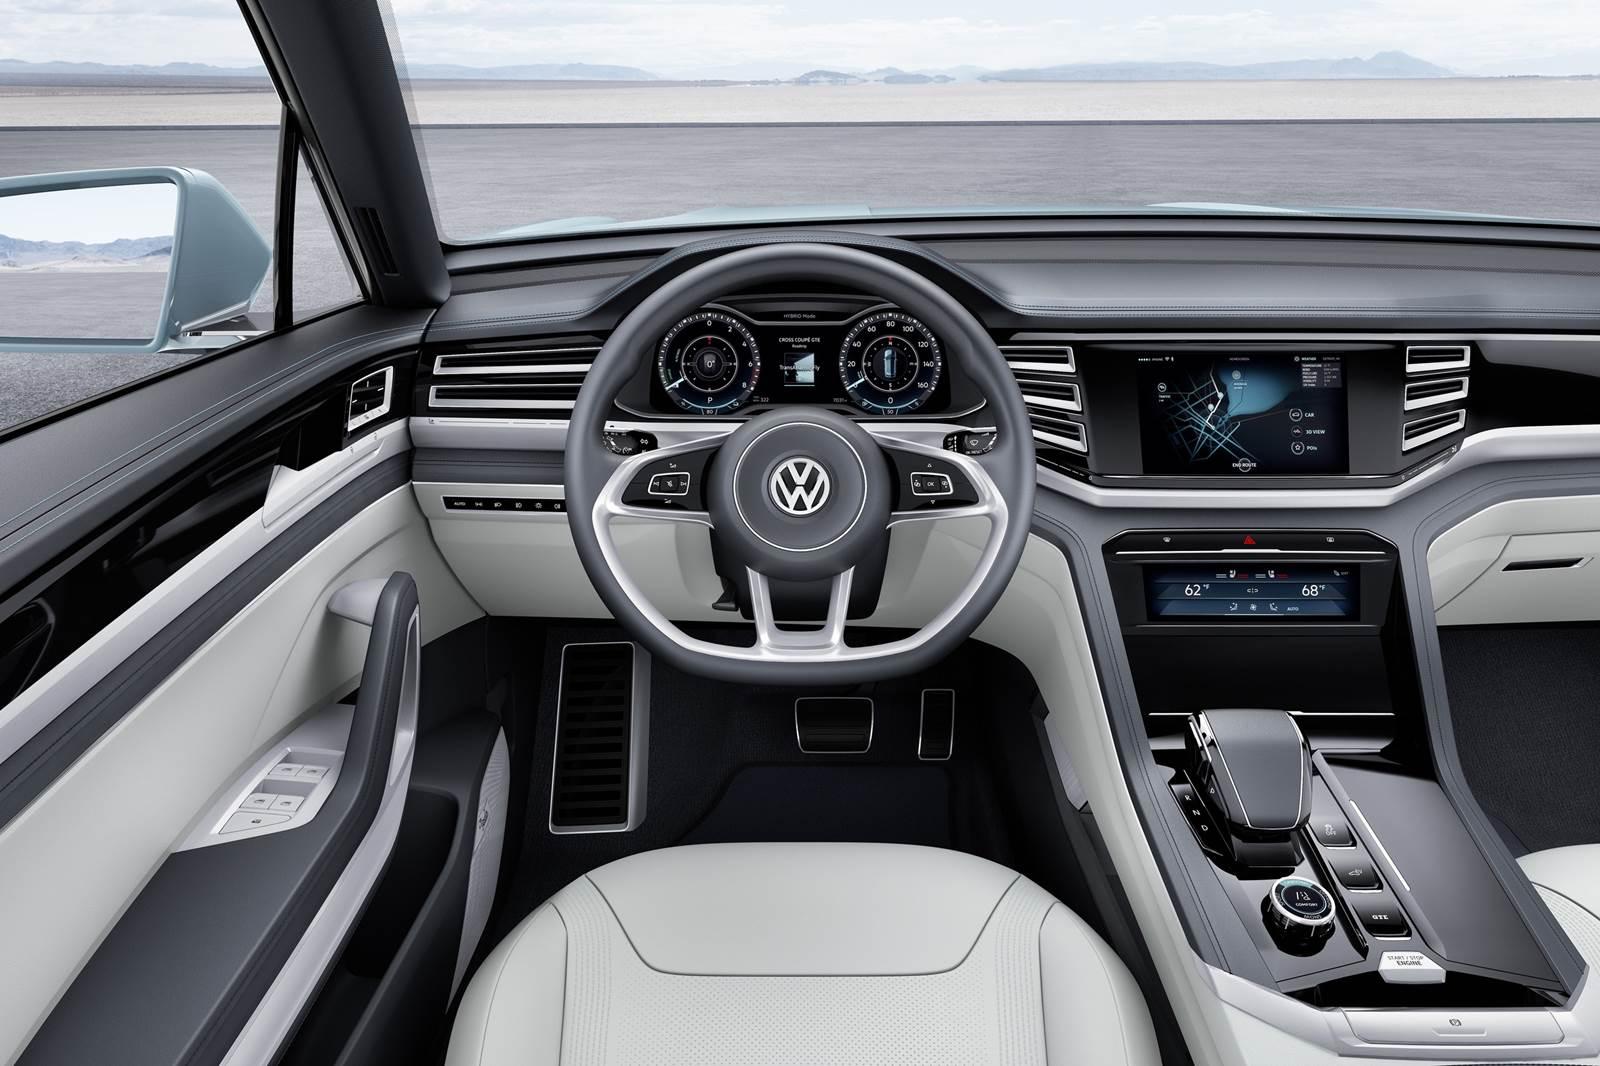 volkswagen cross coup gte antecipa linhas do golf suv car blog br. Black Bedroom Furniture Sets. Home Design Ideas